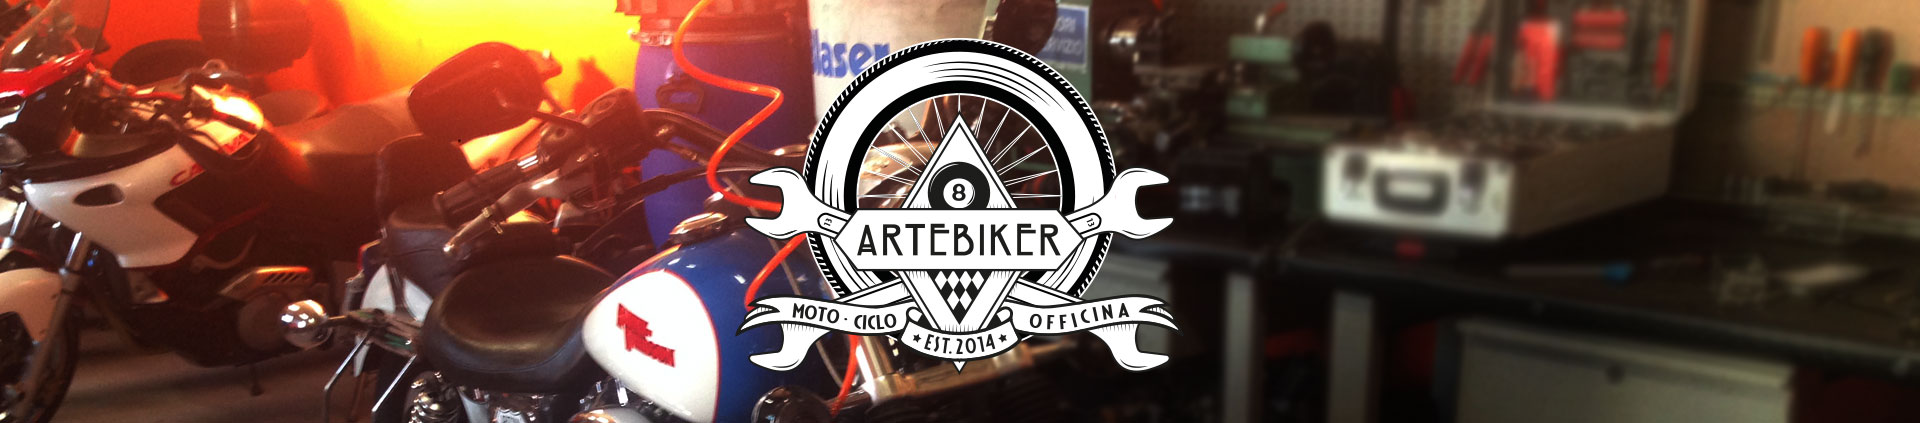 ARTEBIKER_LOGO_03